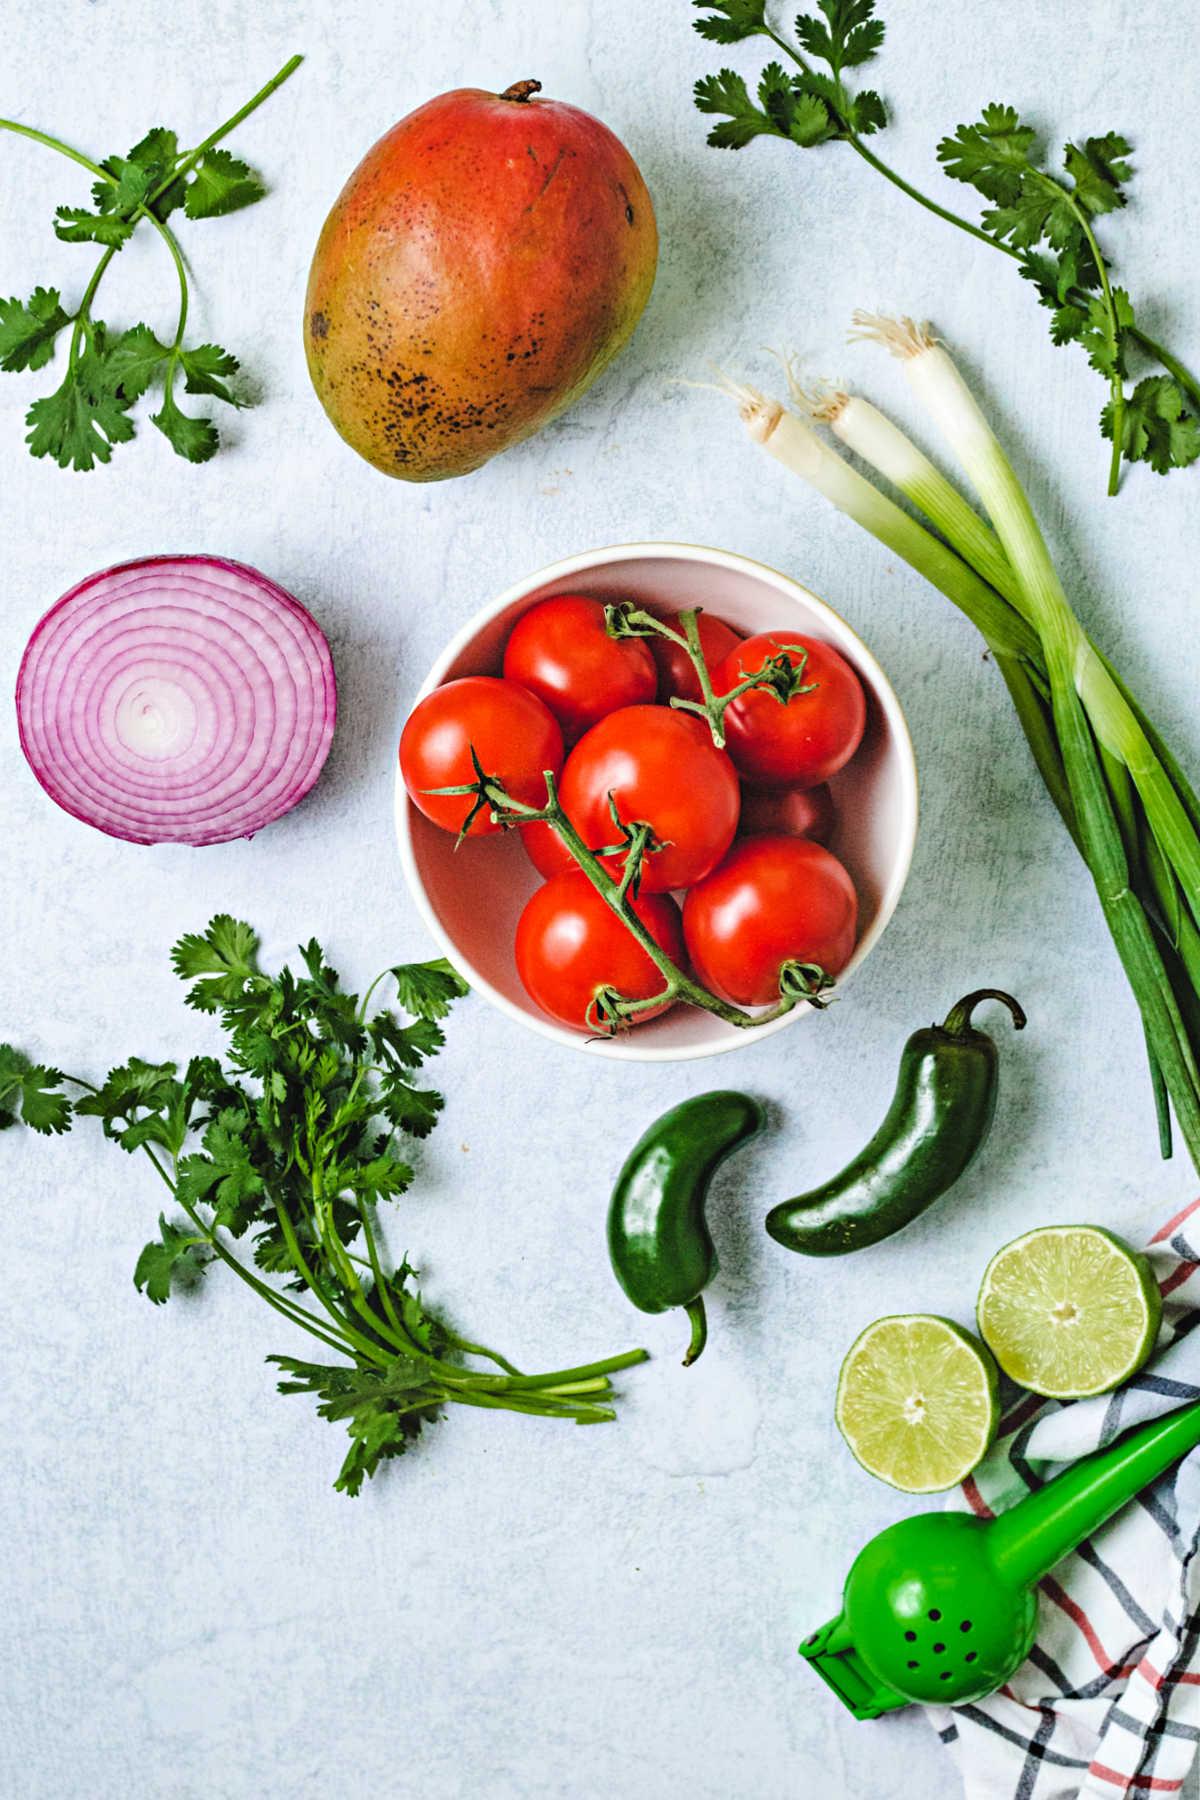 ingredients for mango salsa: tomatoes, mango, cilantro, red onion, scallions, lime, and jalapeno.